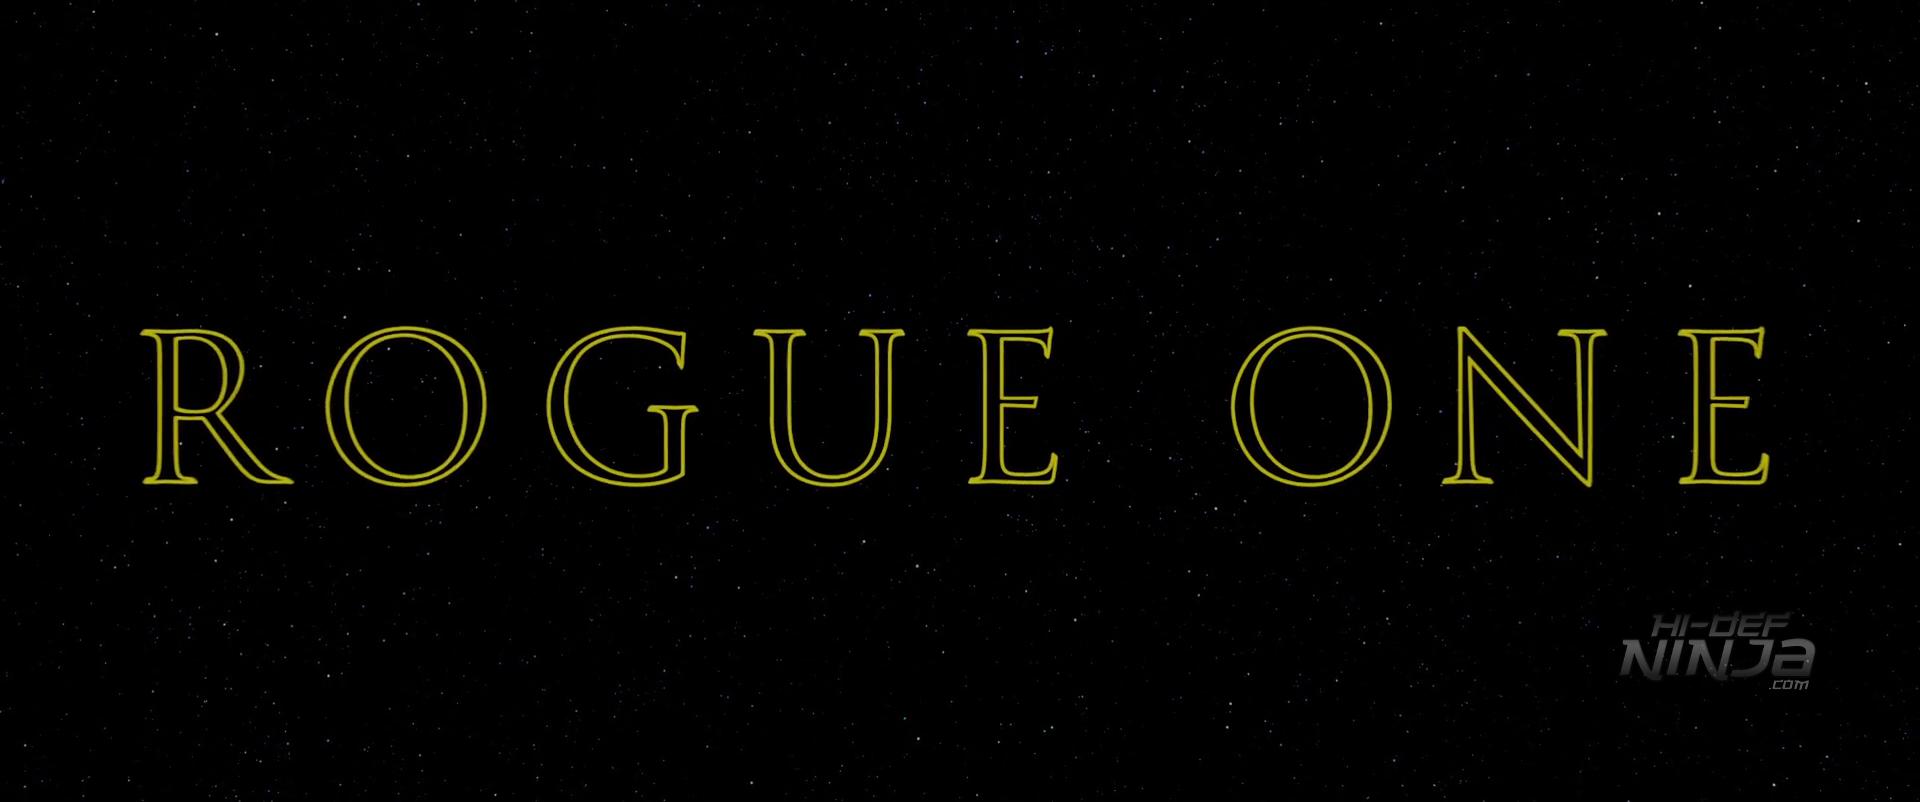 Rogue-One-HiDefNinja (1)